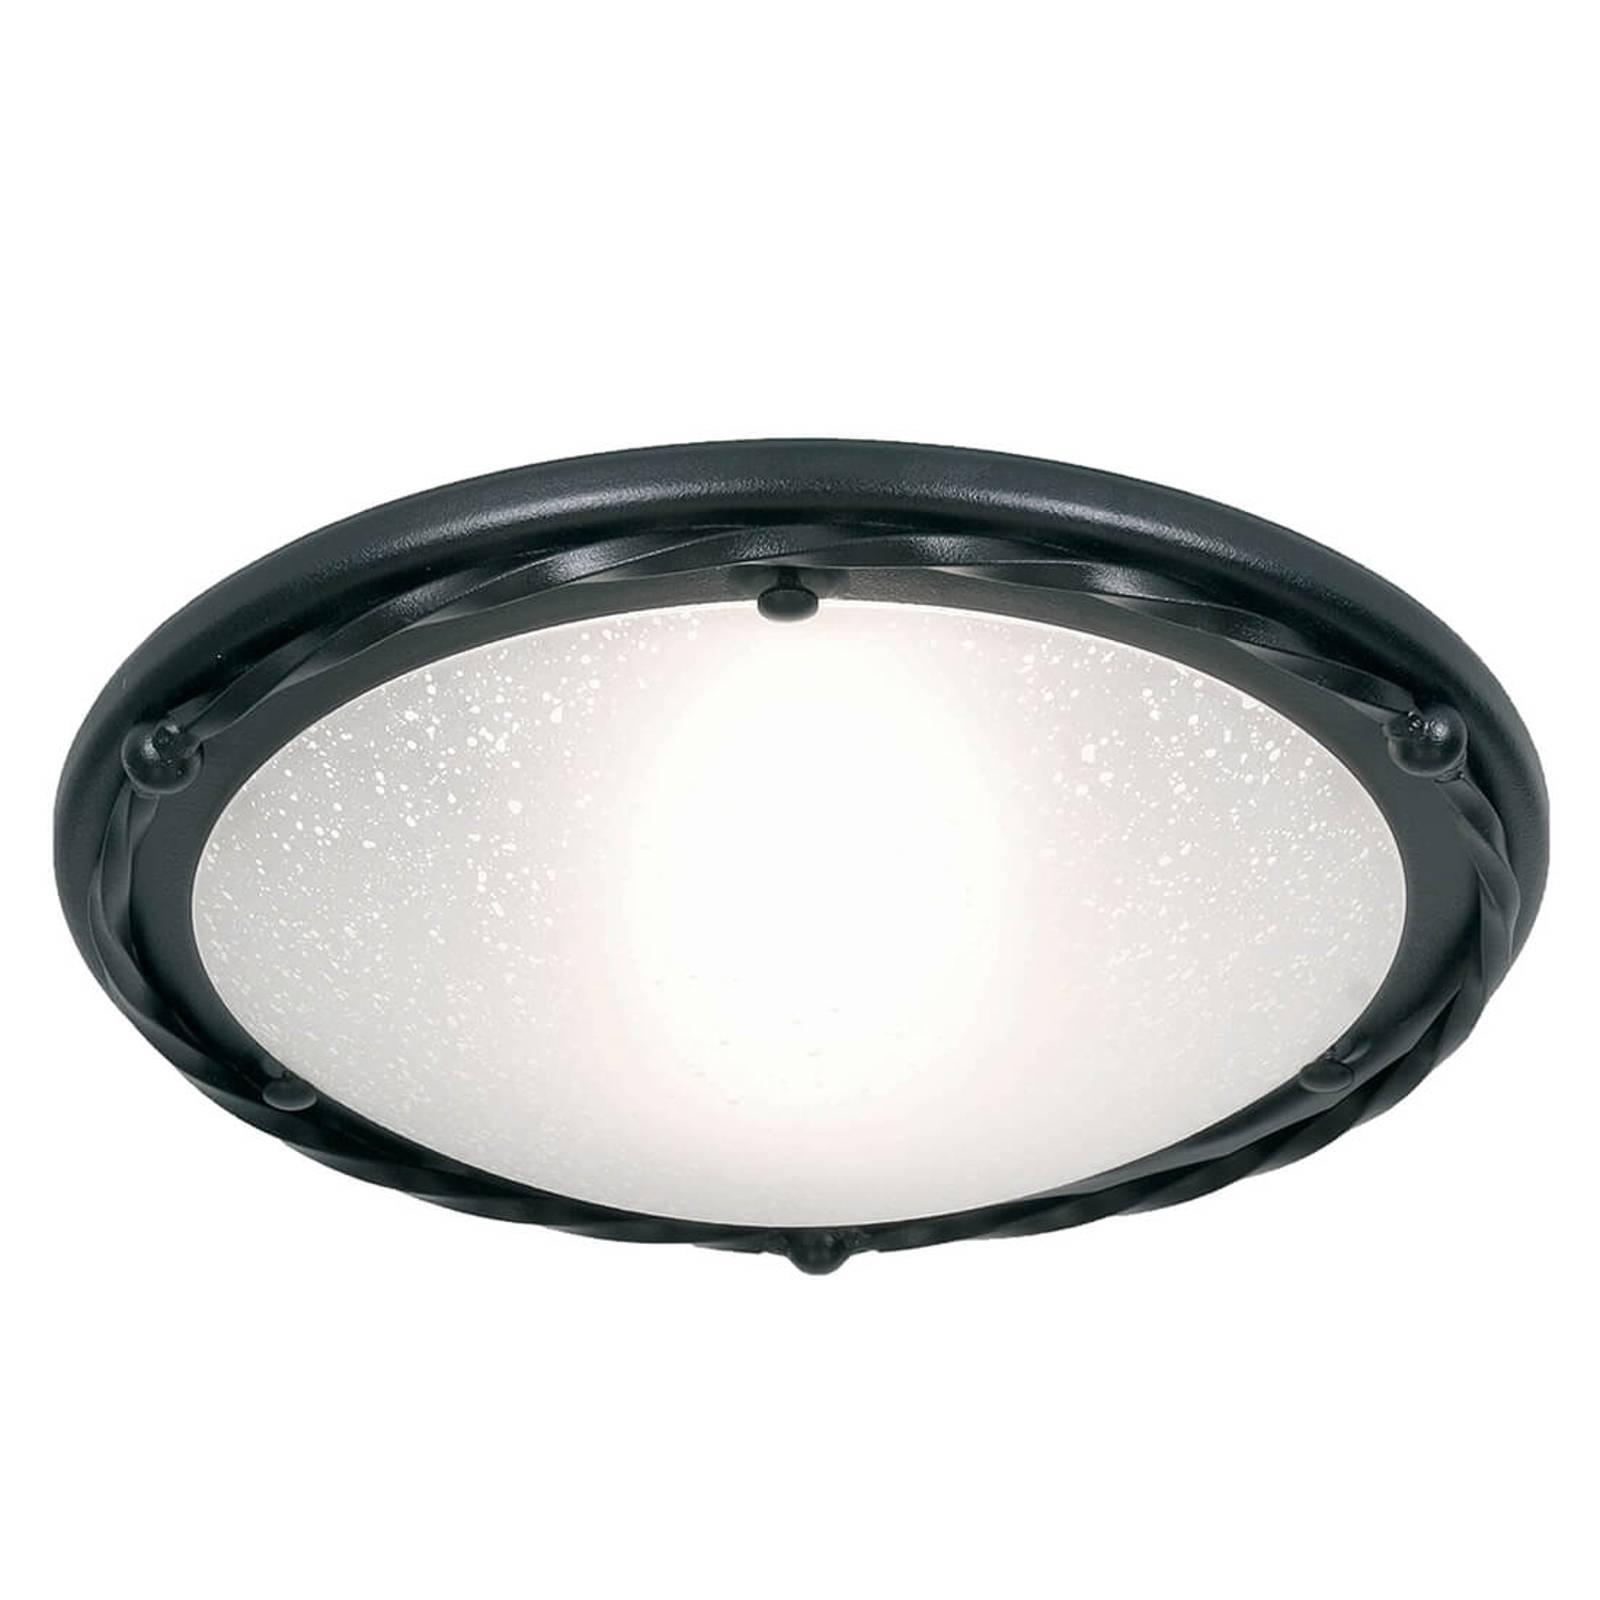 Okrągła lampa sufitowa Pembroke – czarna podstawa